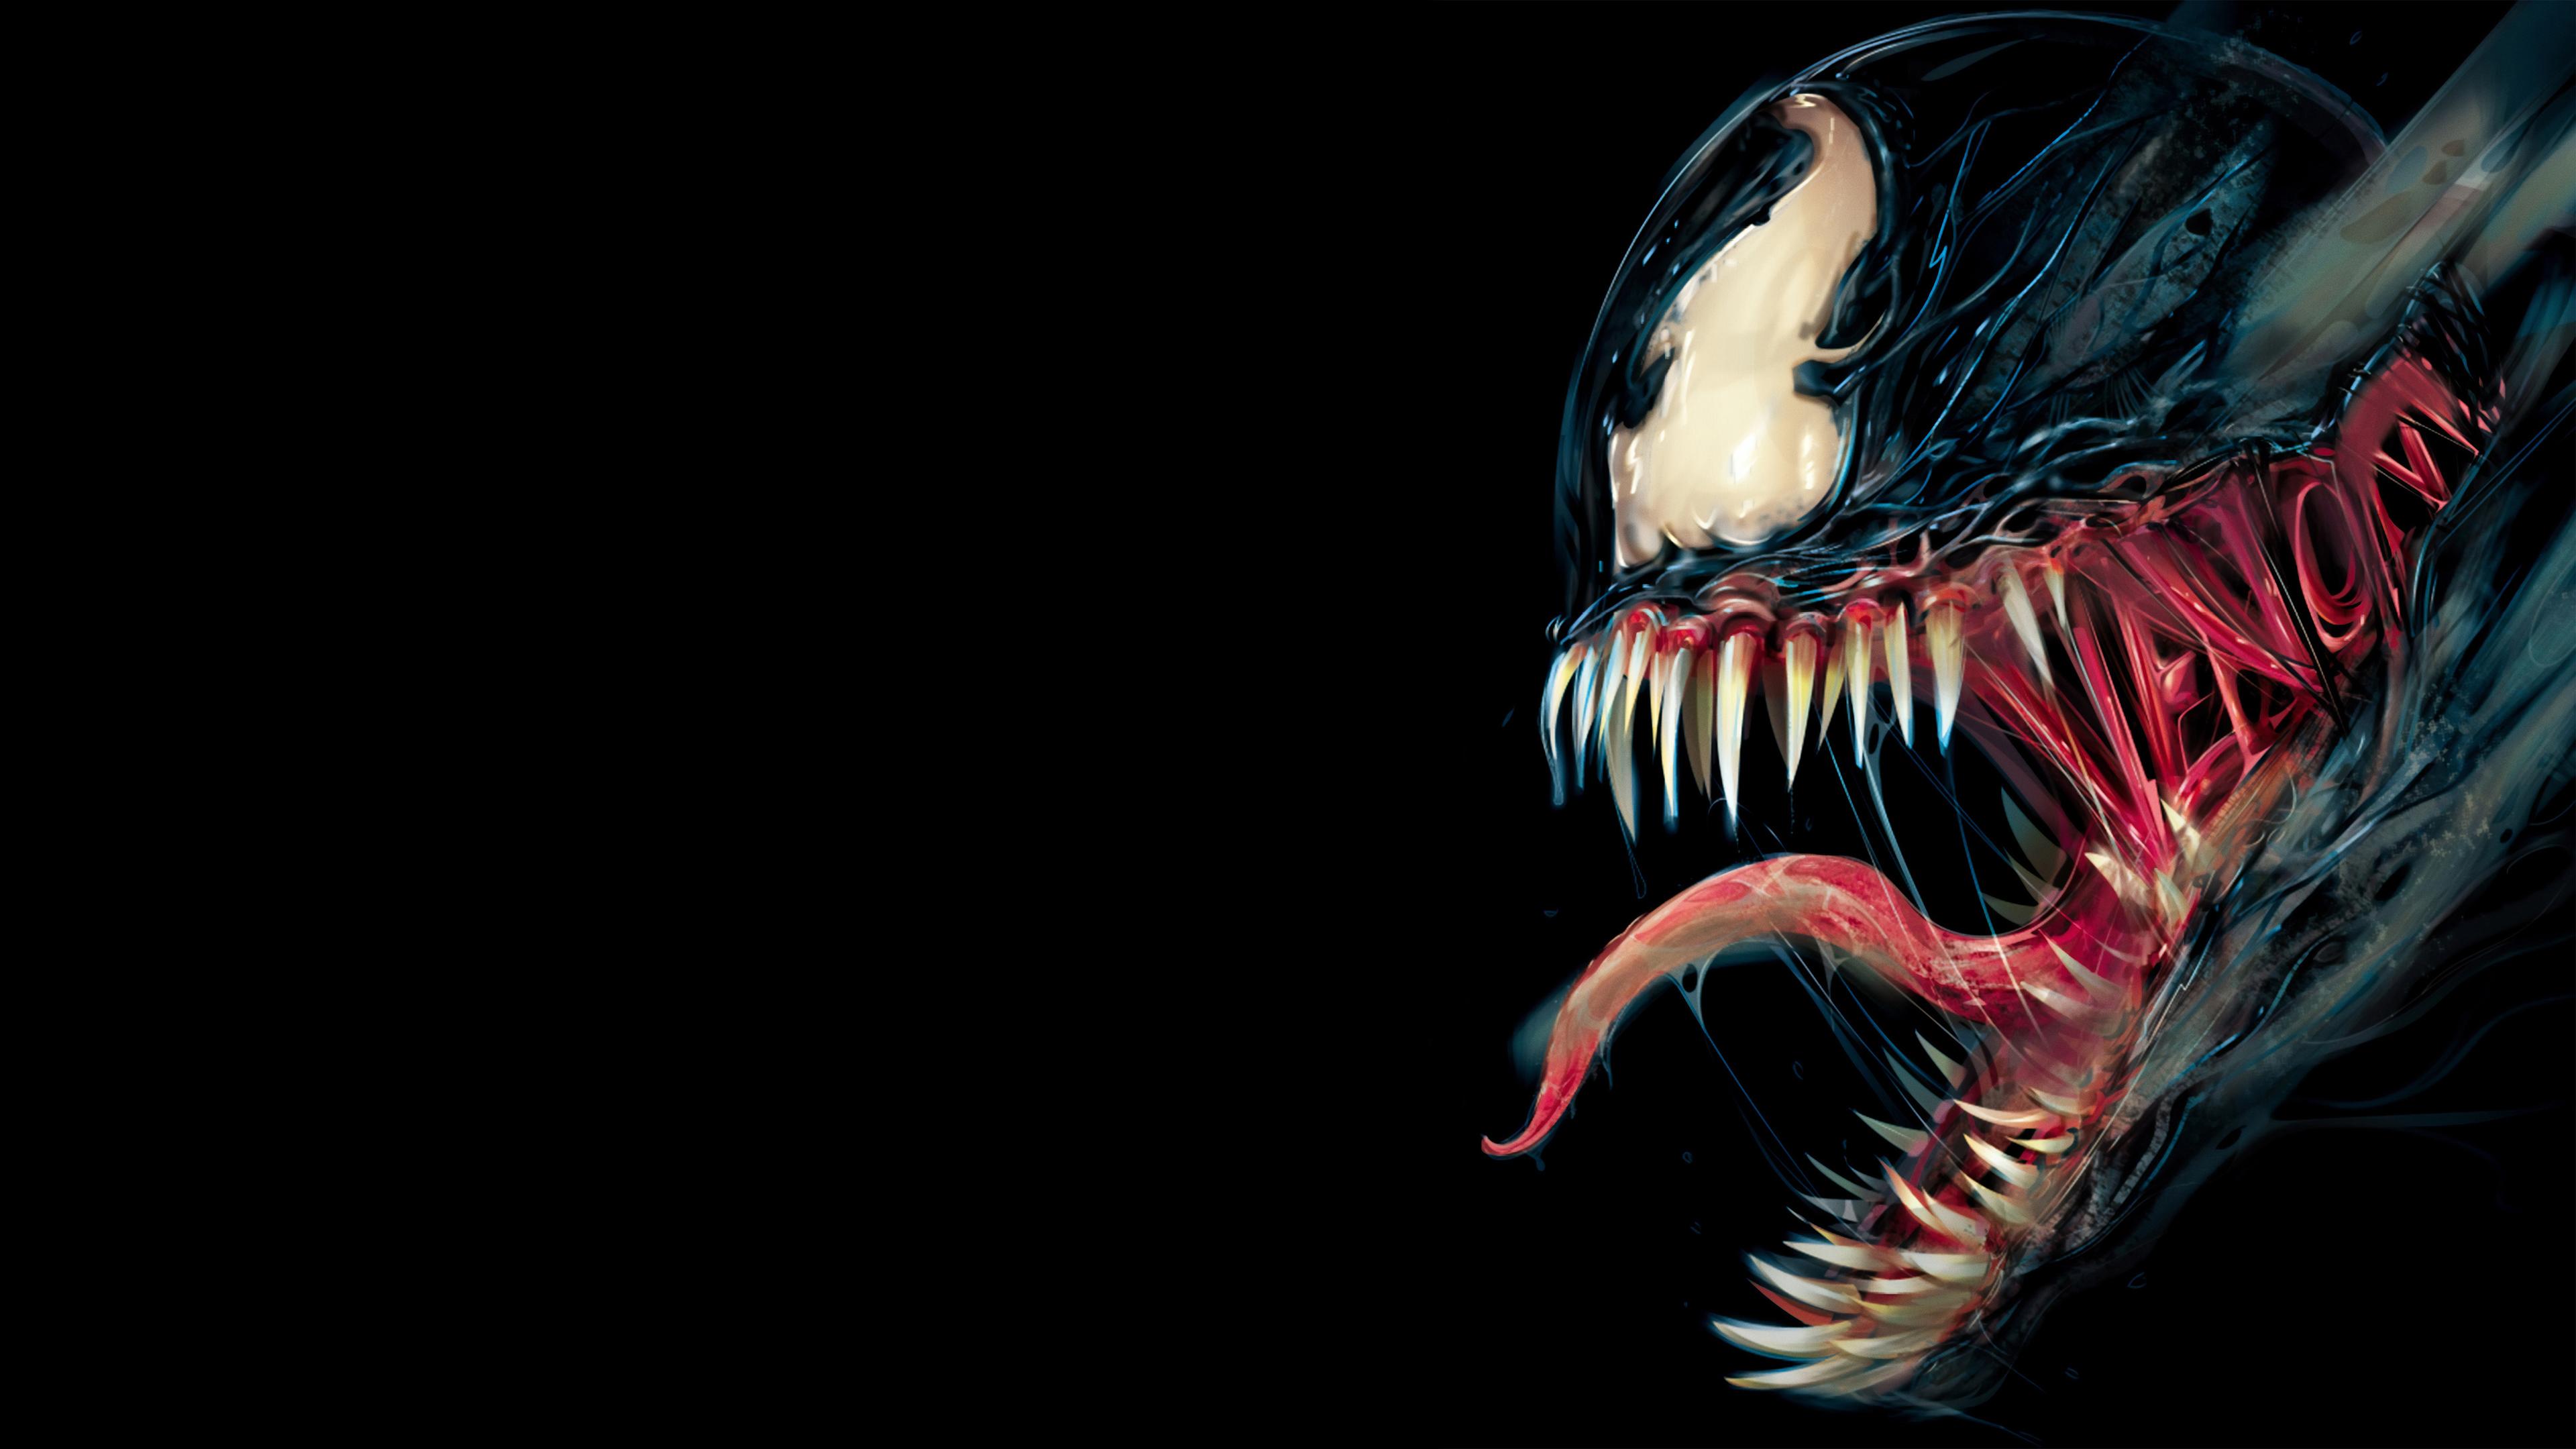 Wallpaper 4k Venom Movie 4k Poster 2018 Movies Wallpapers 4k